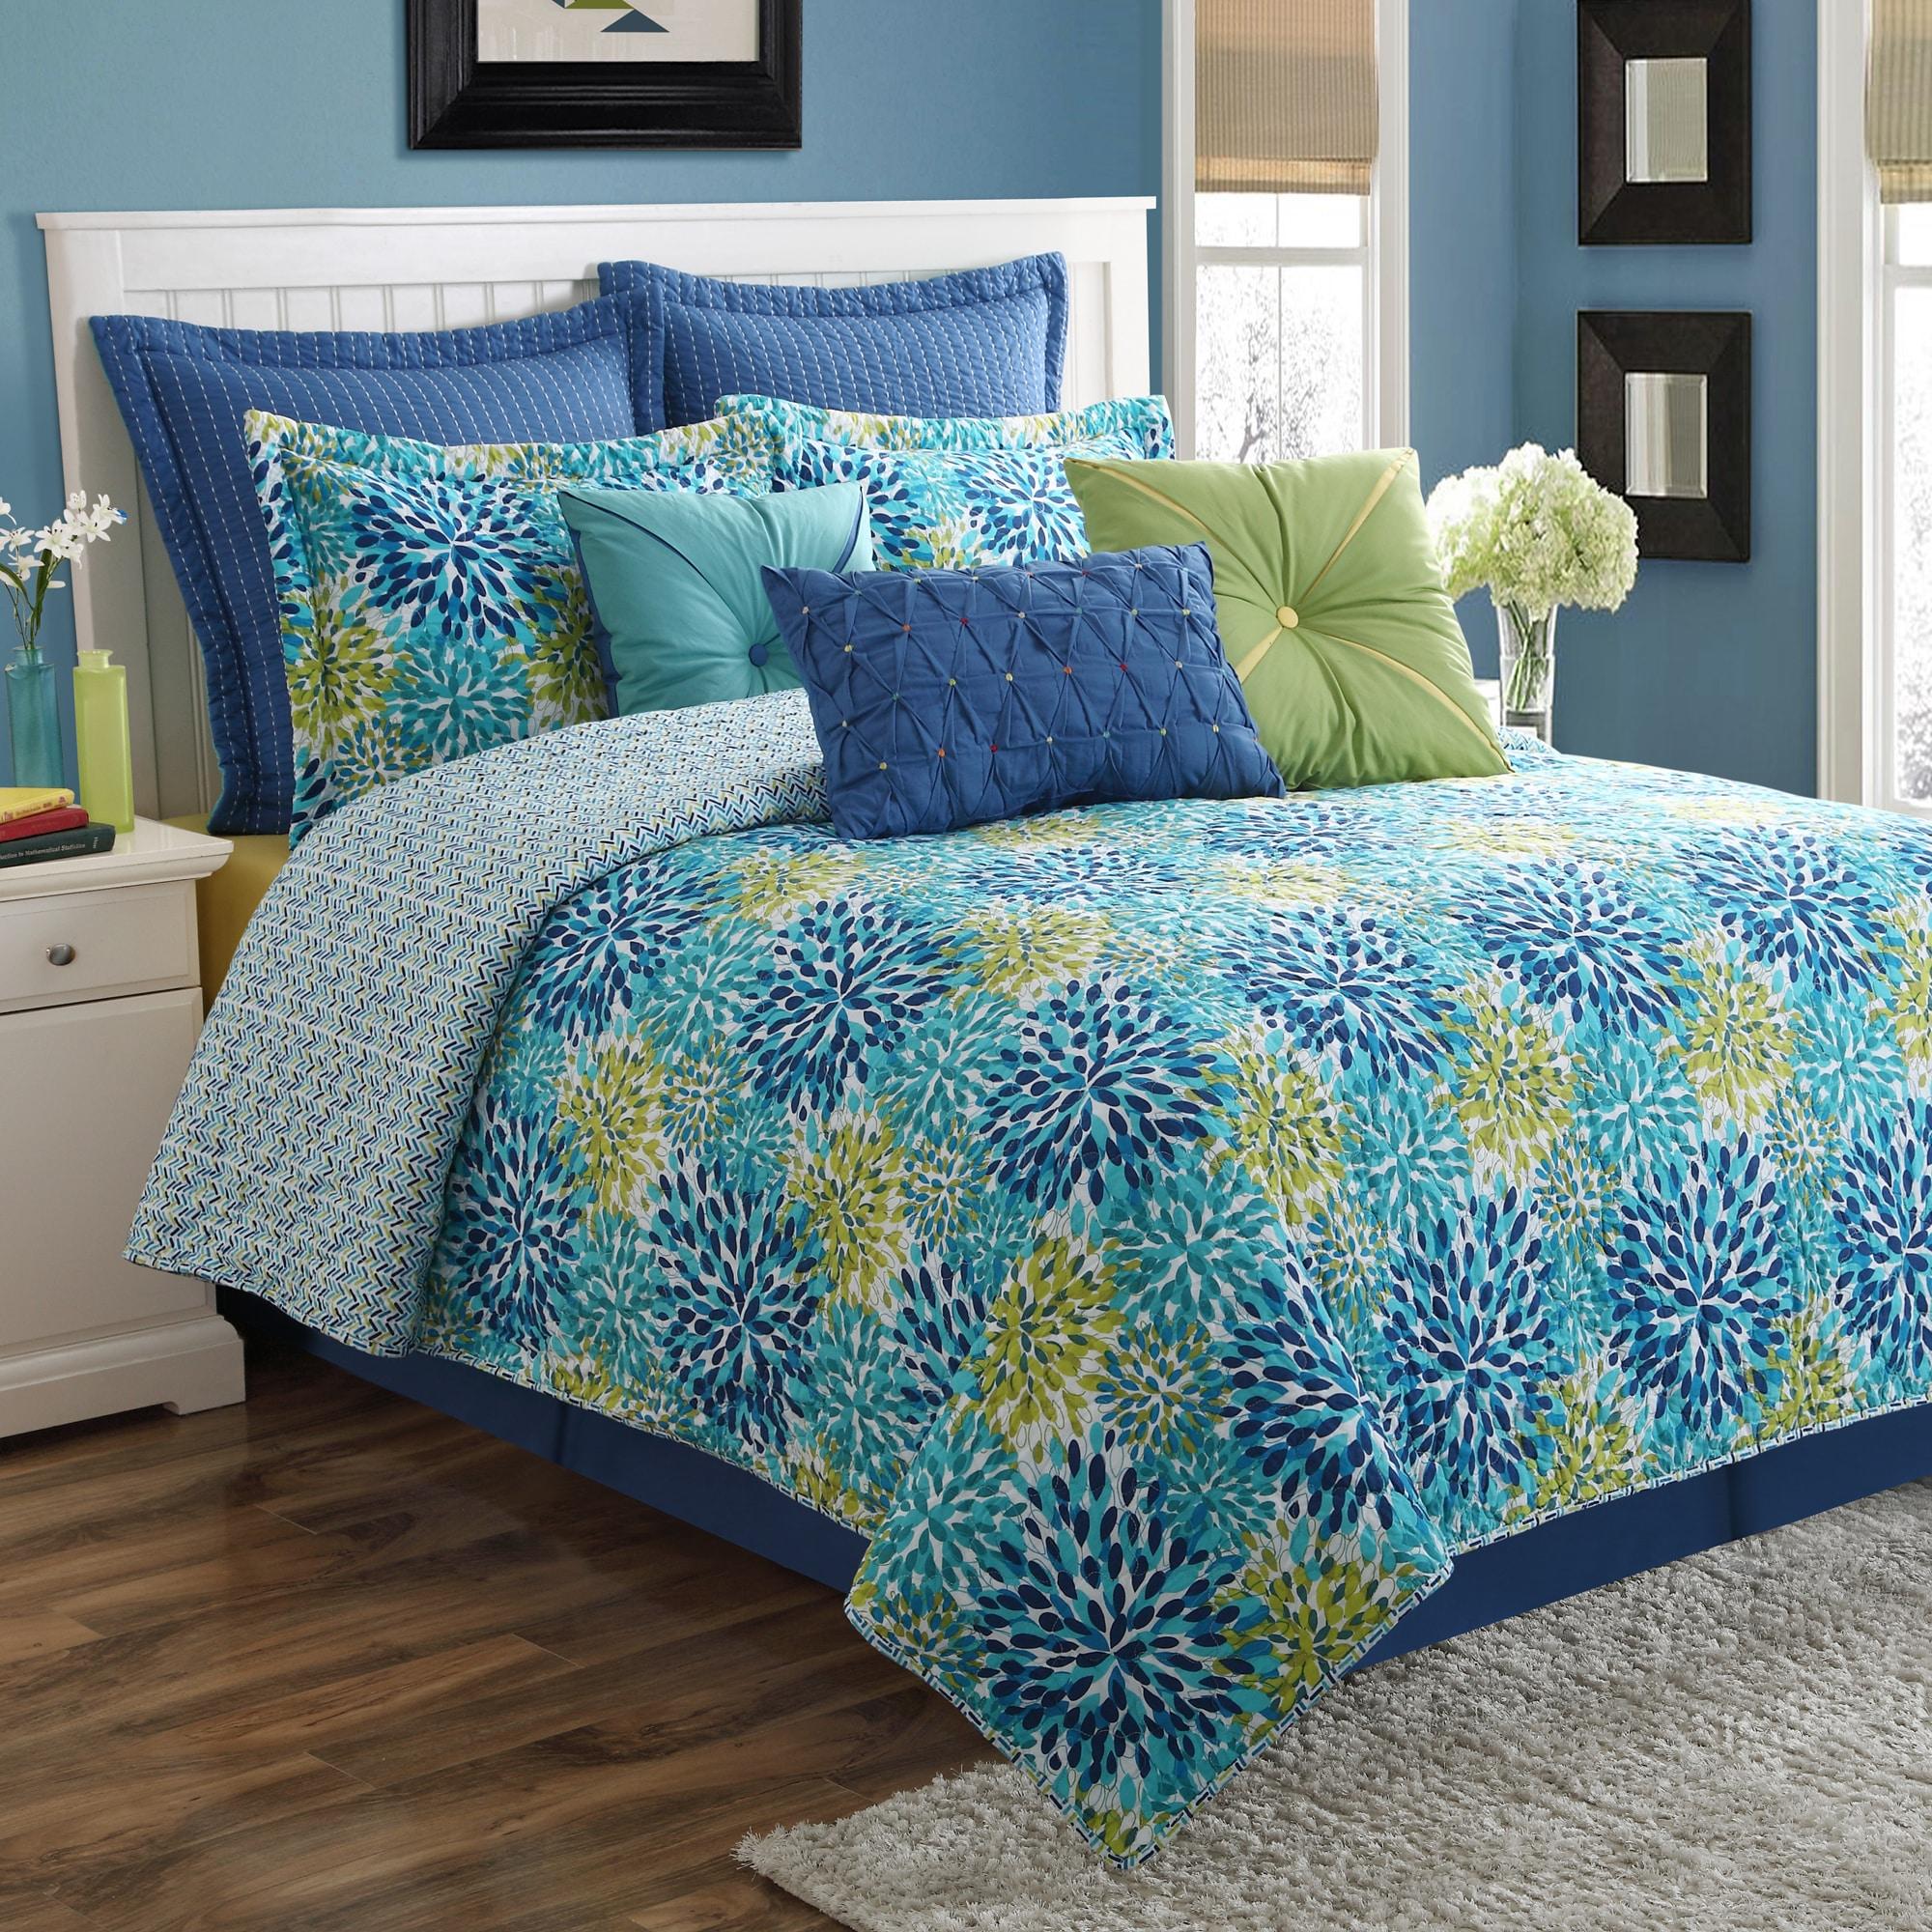 Fiesta Calypso Garden Cotton Quilt Set (King), Blue